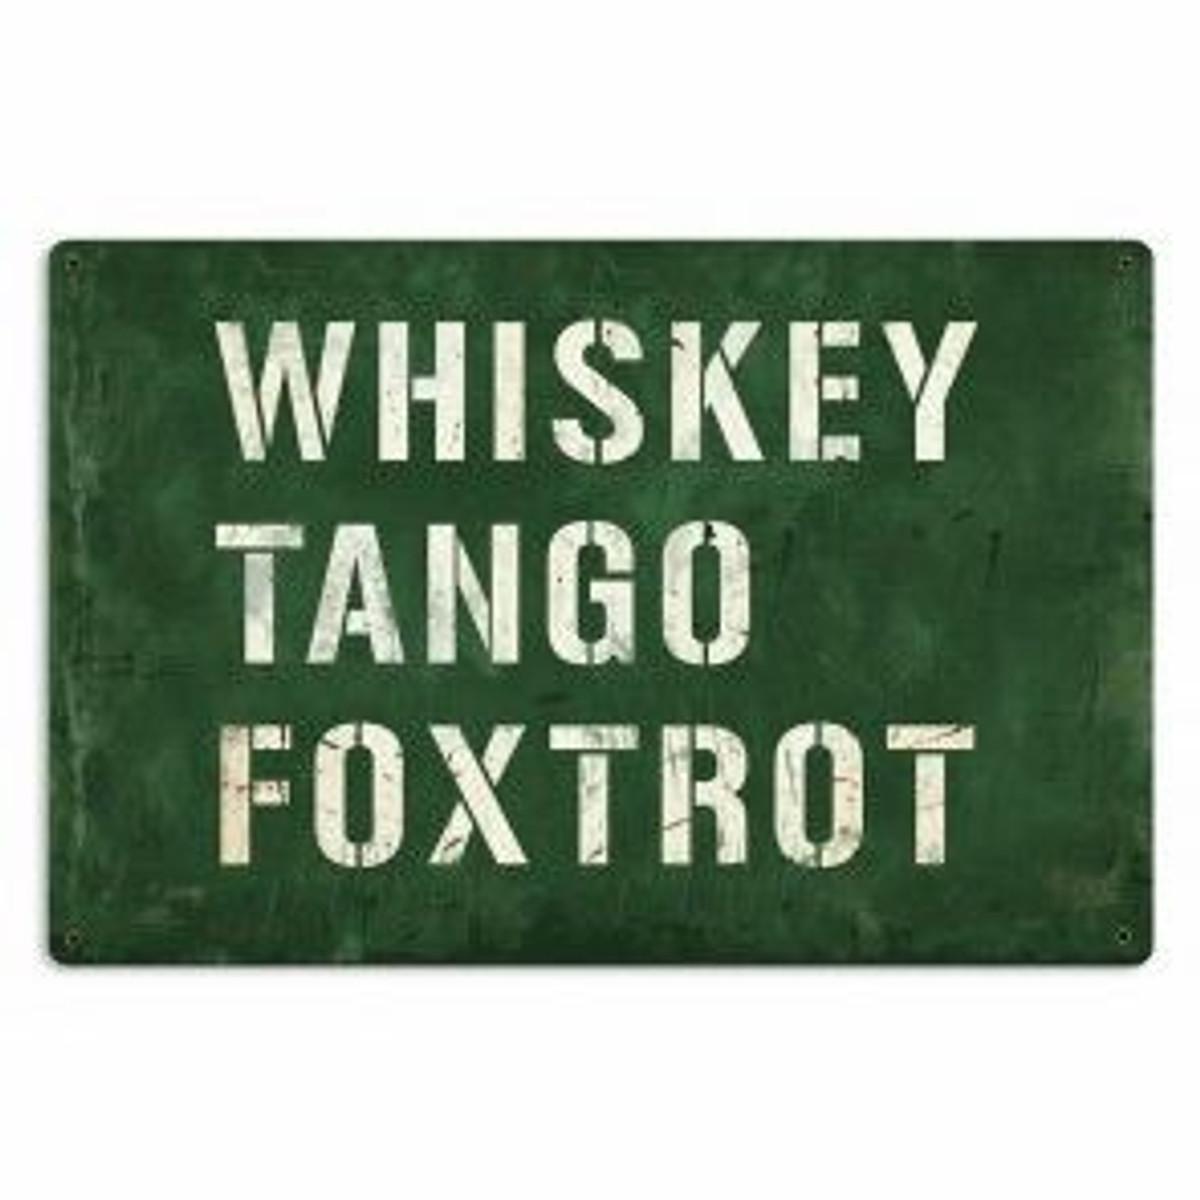 """Whiskey-Tango-Foxtrot"" Metal Sign.  Measures 17 1/2"" X 11 1/2"""